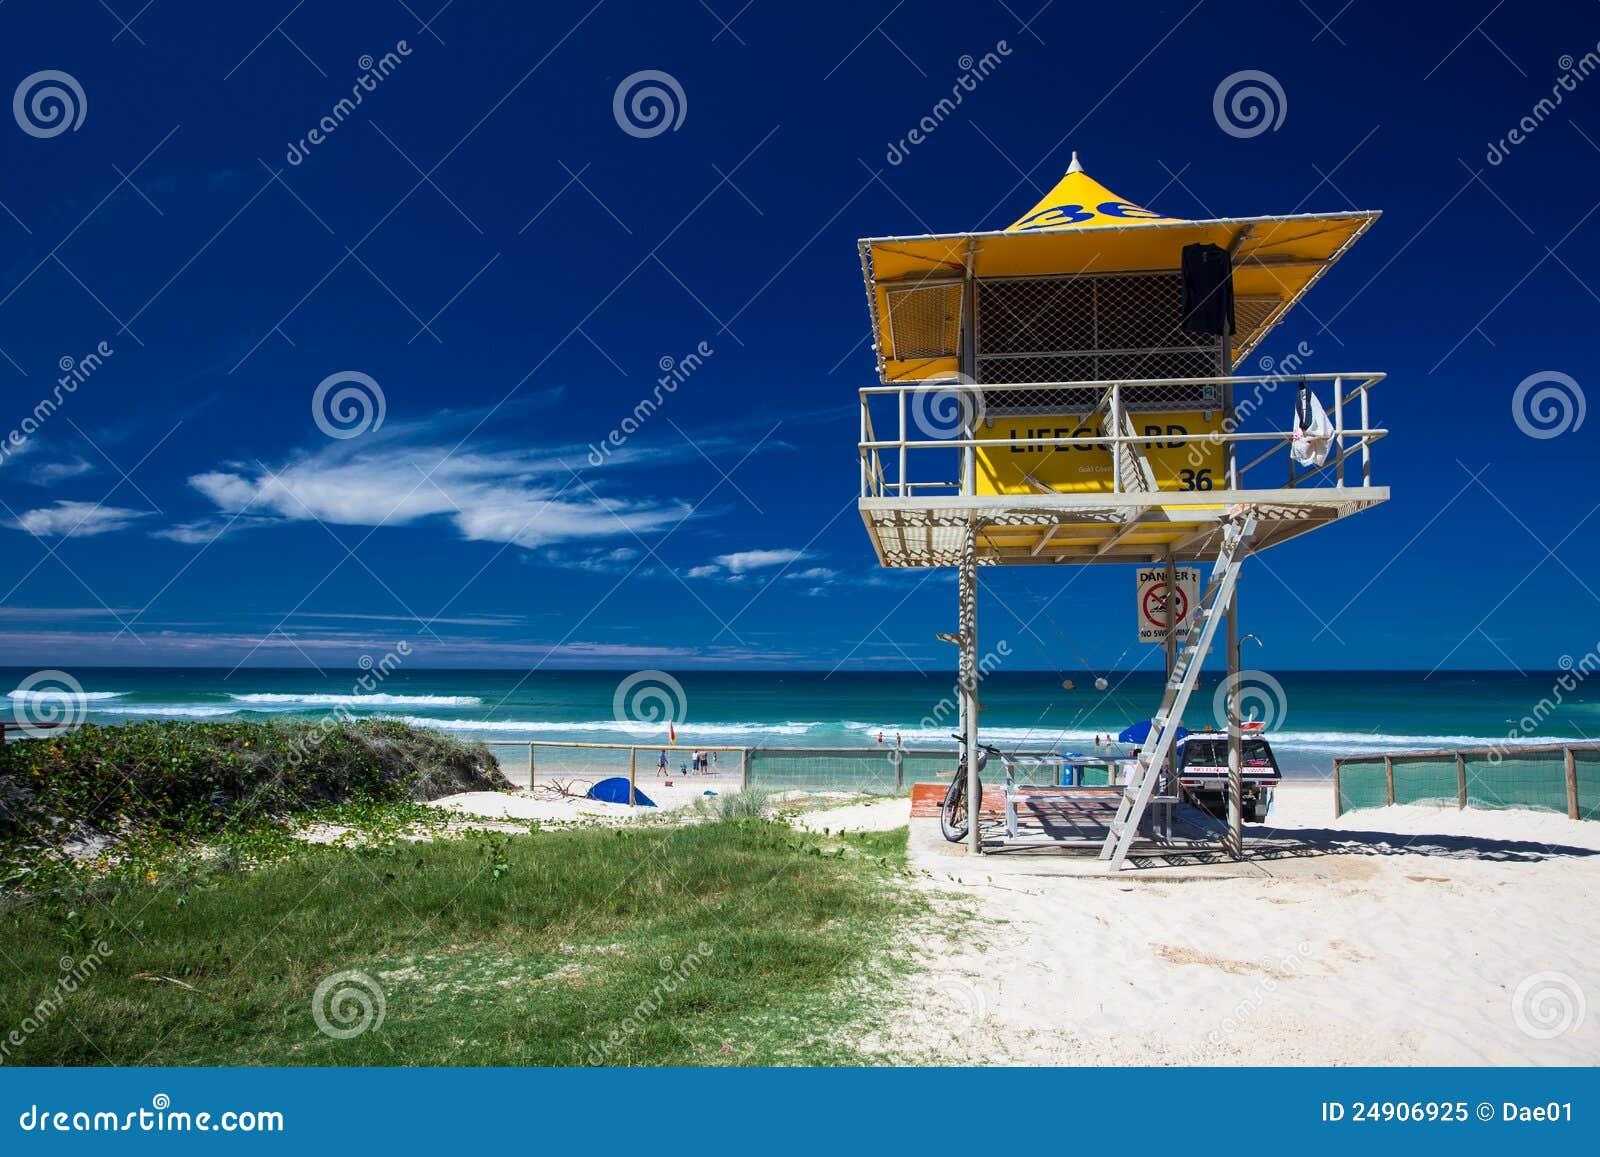 e0656fe5026 Lifesaver patrol tower stock image. Image of coast